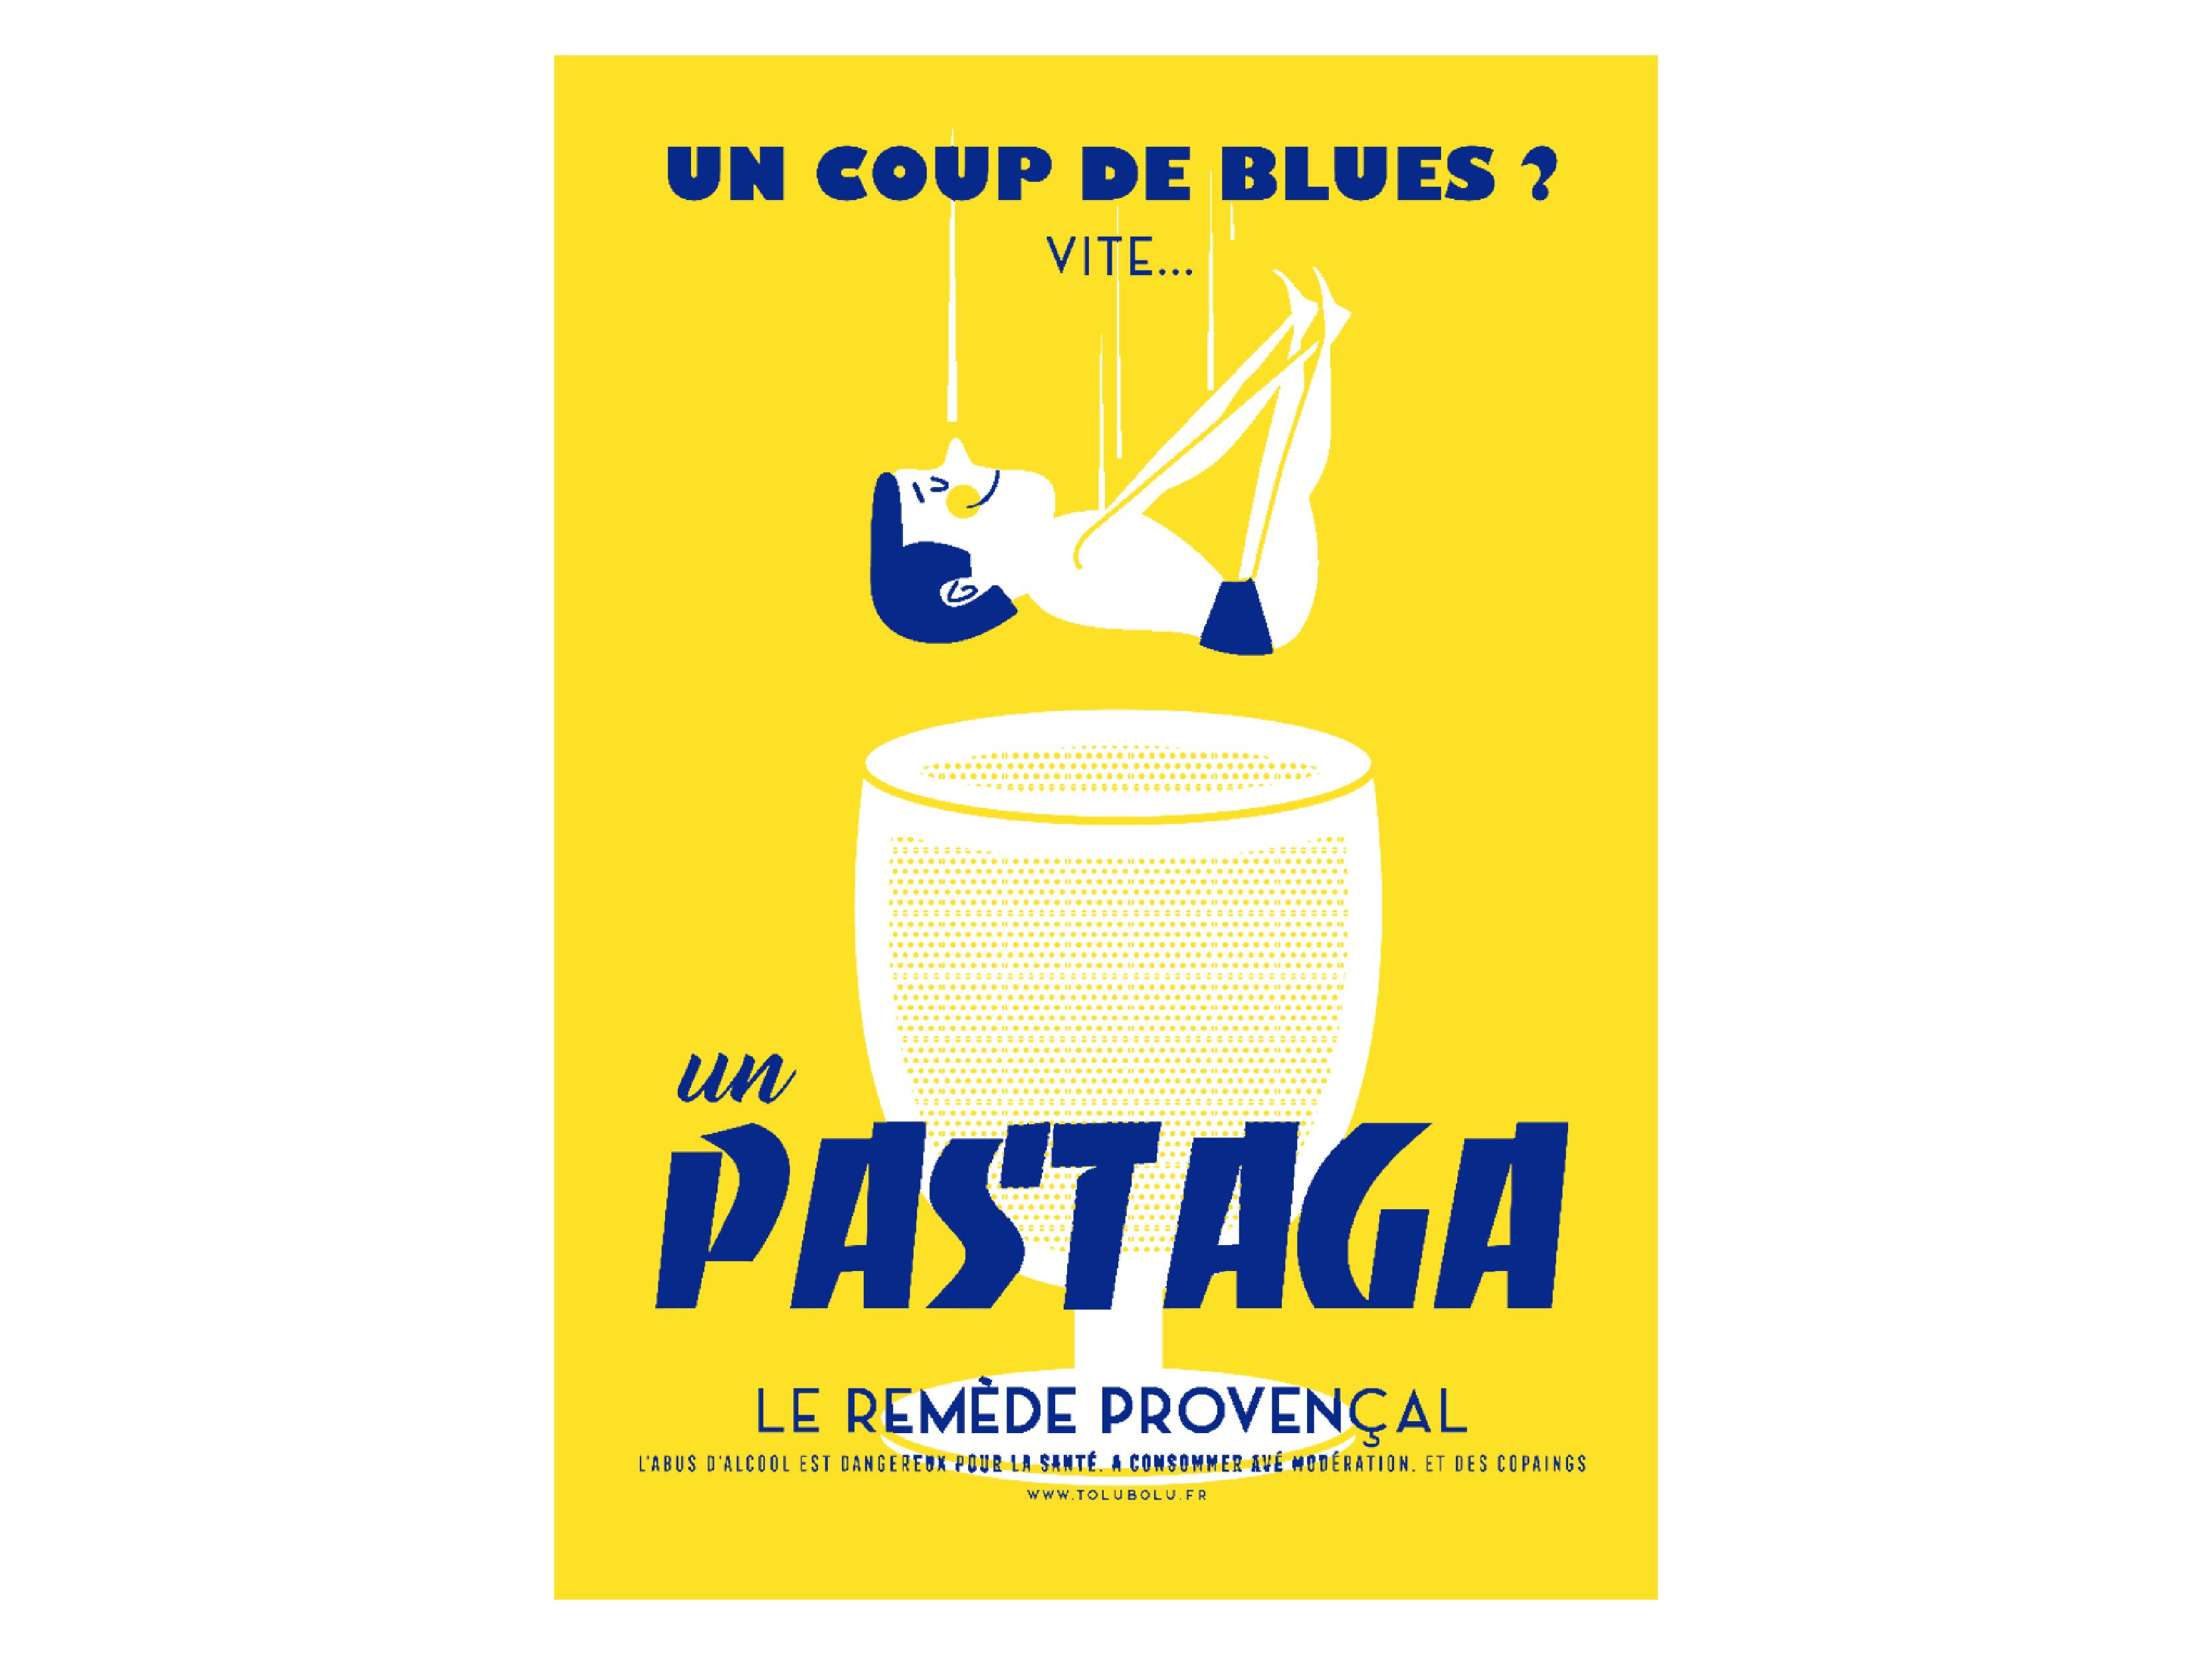 Tolubolu-pastaga-serigraphie-vintage-poster-fwells-paris